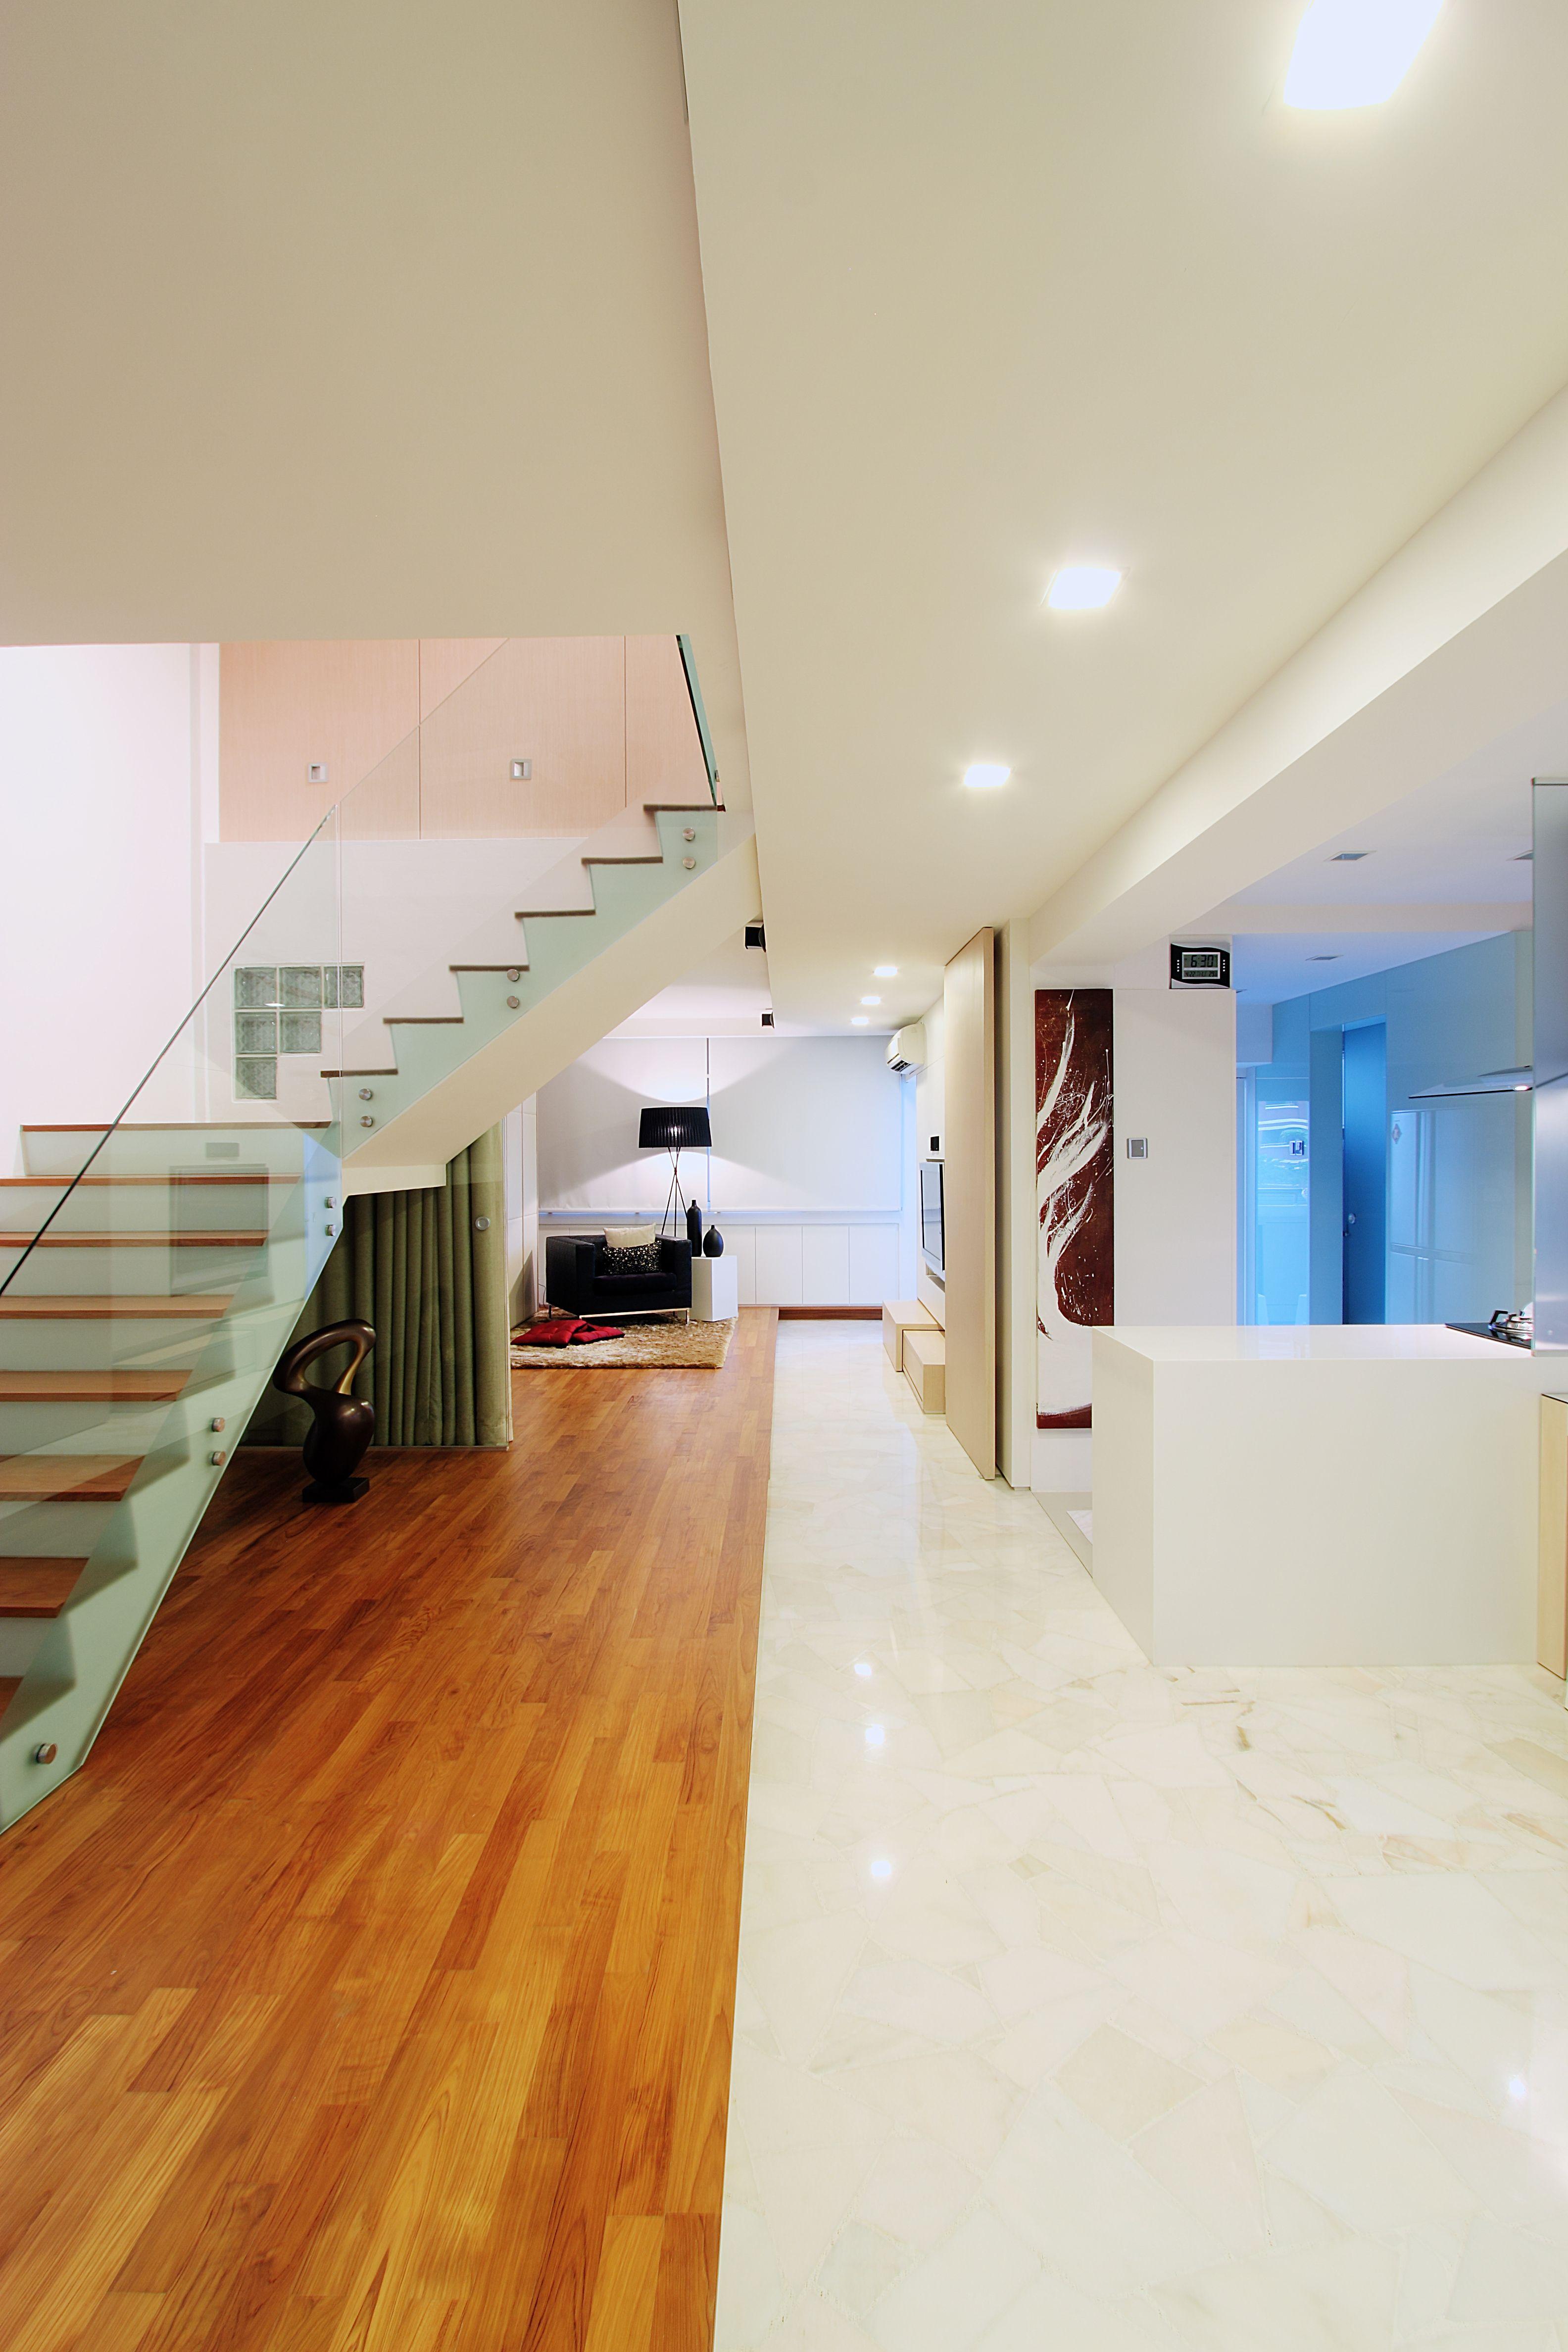 Home Decor Home decor, Marble floor, Flooring